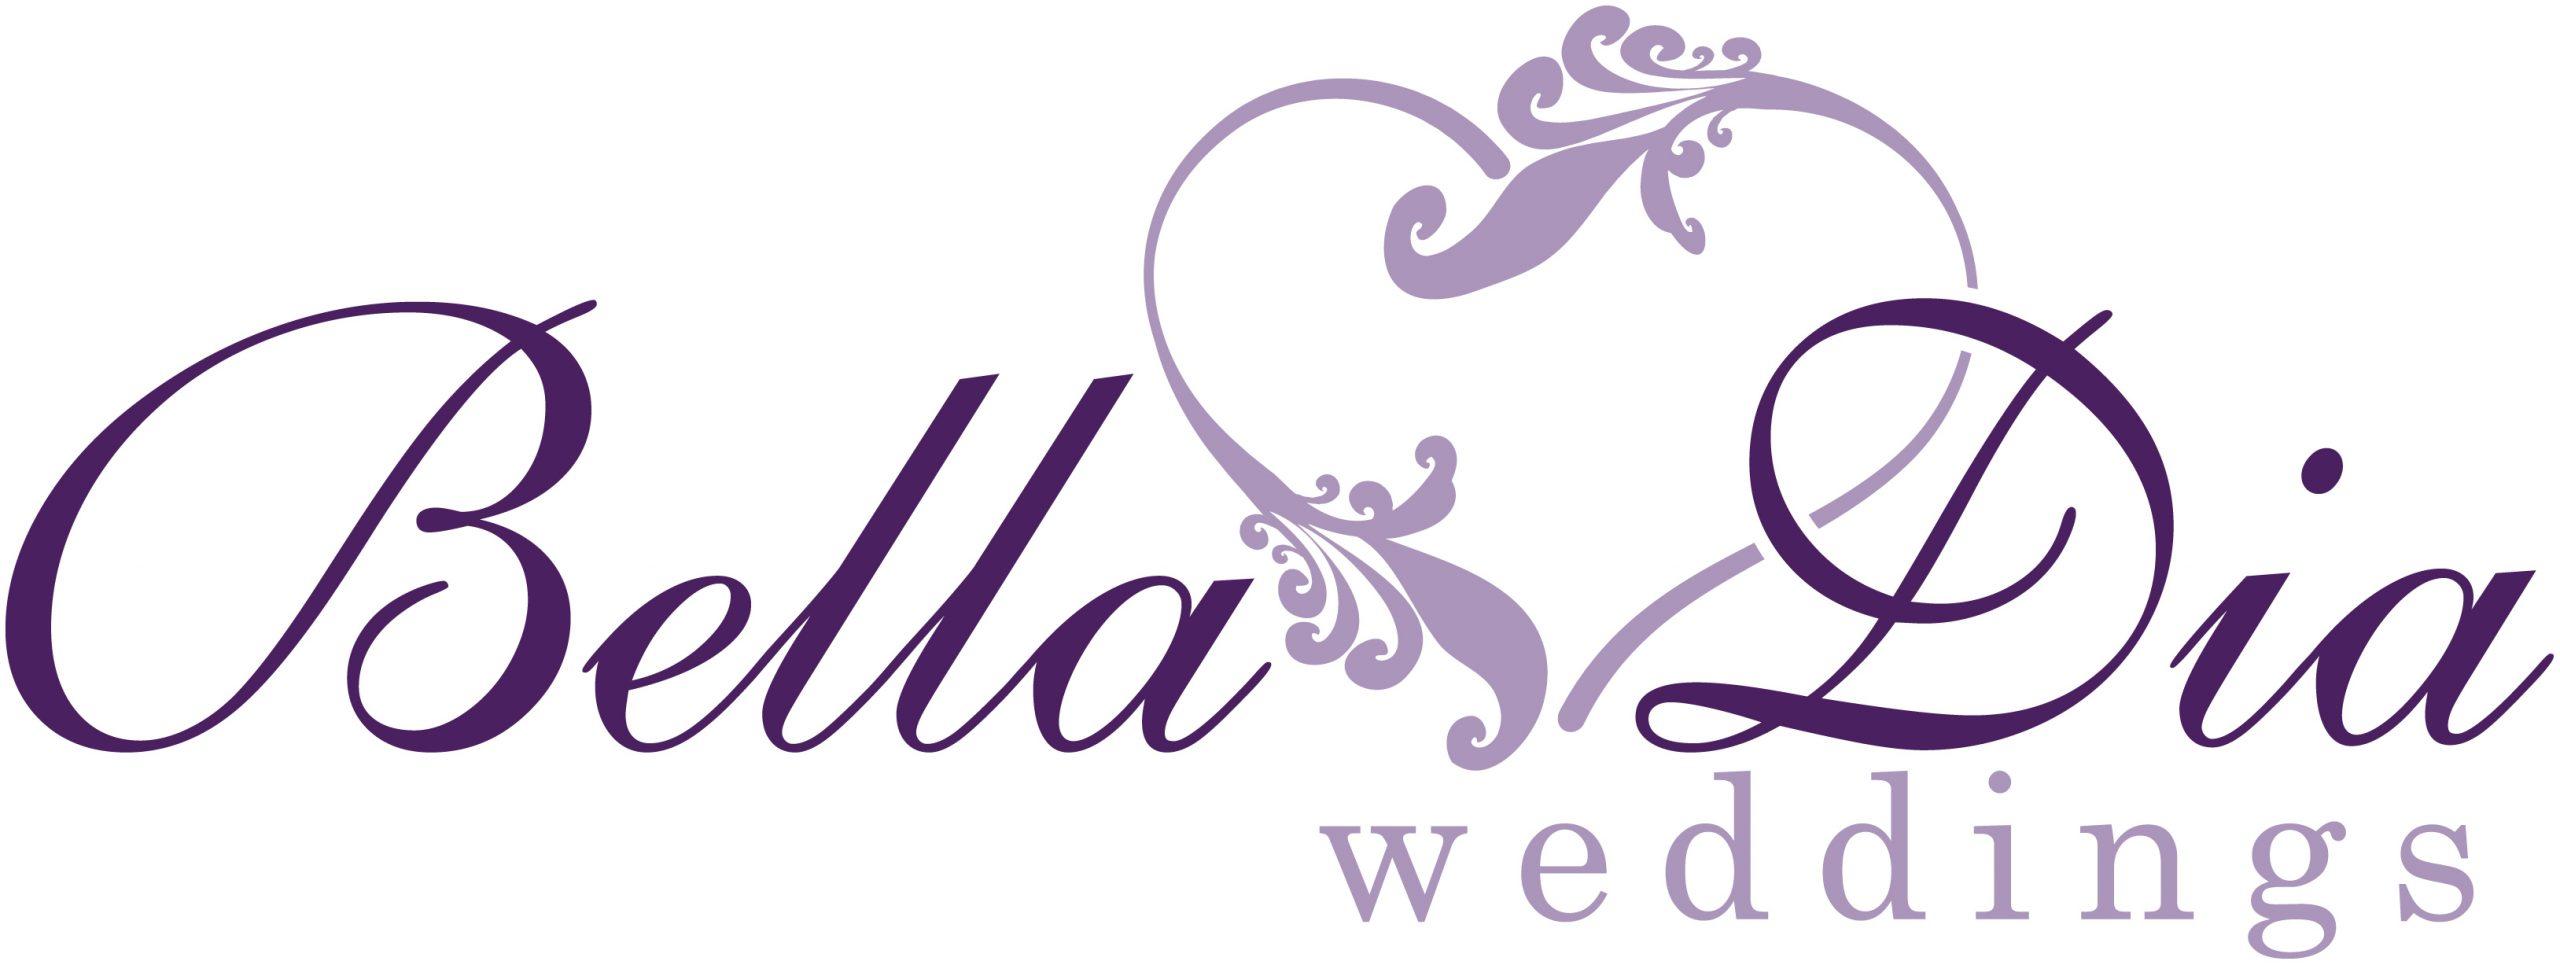 Bella Dia Weddings, Logo Design